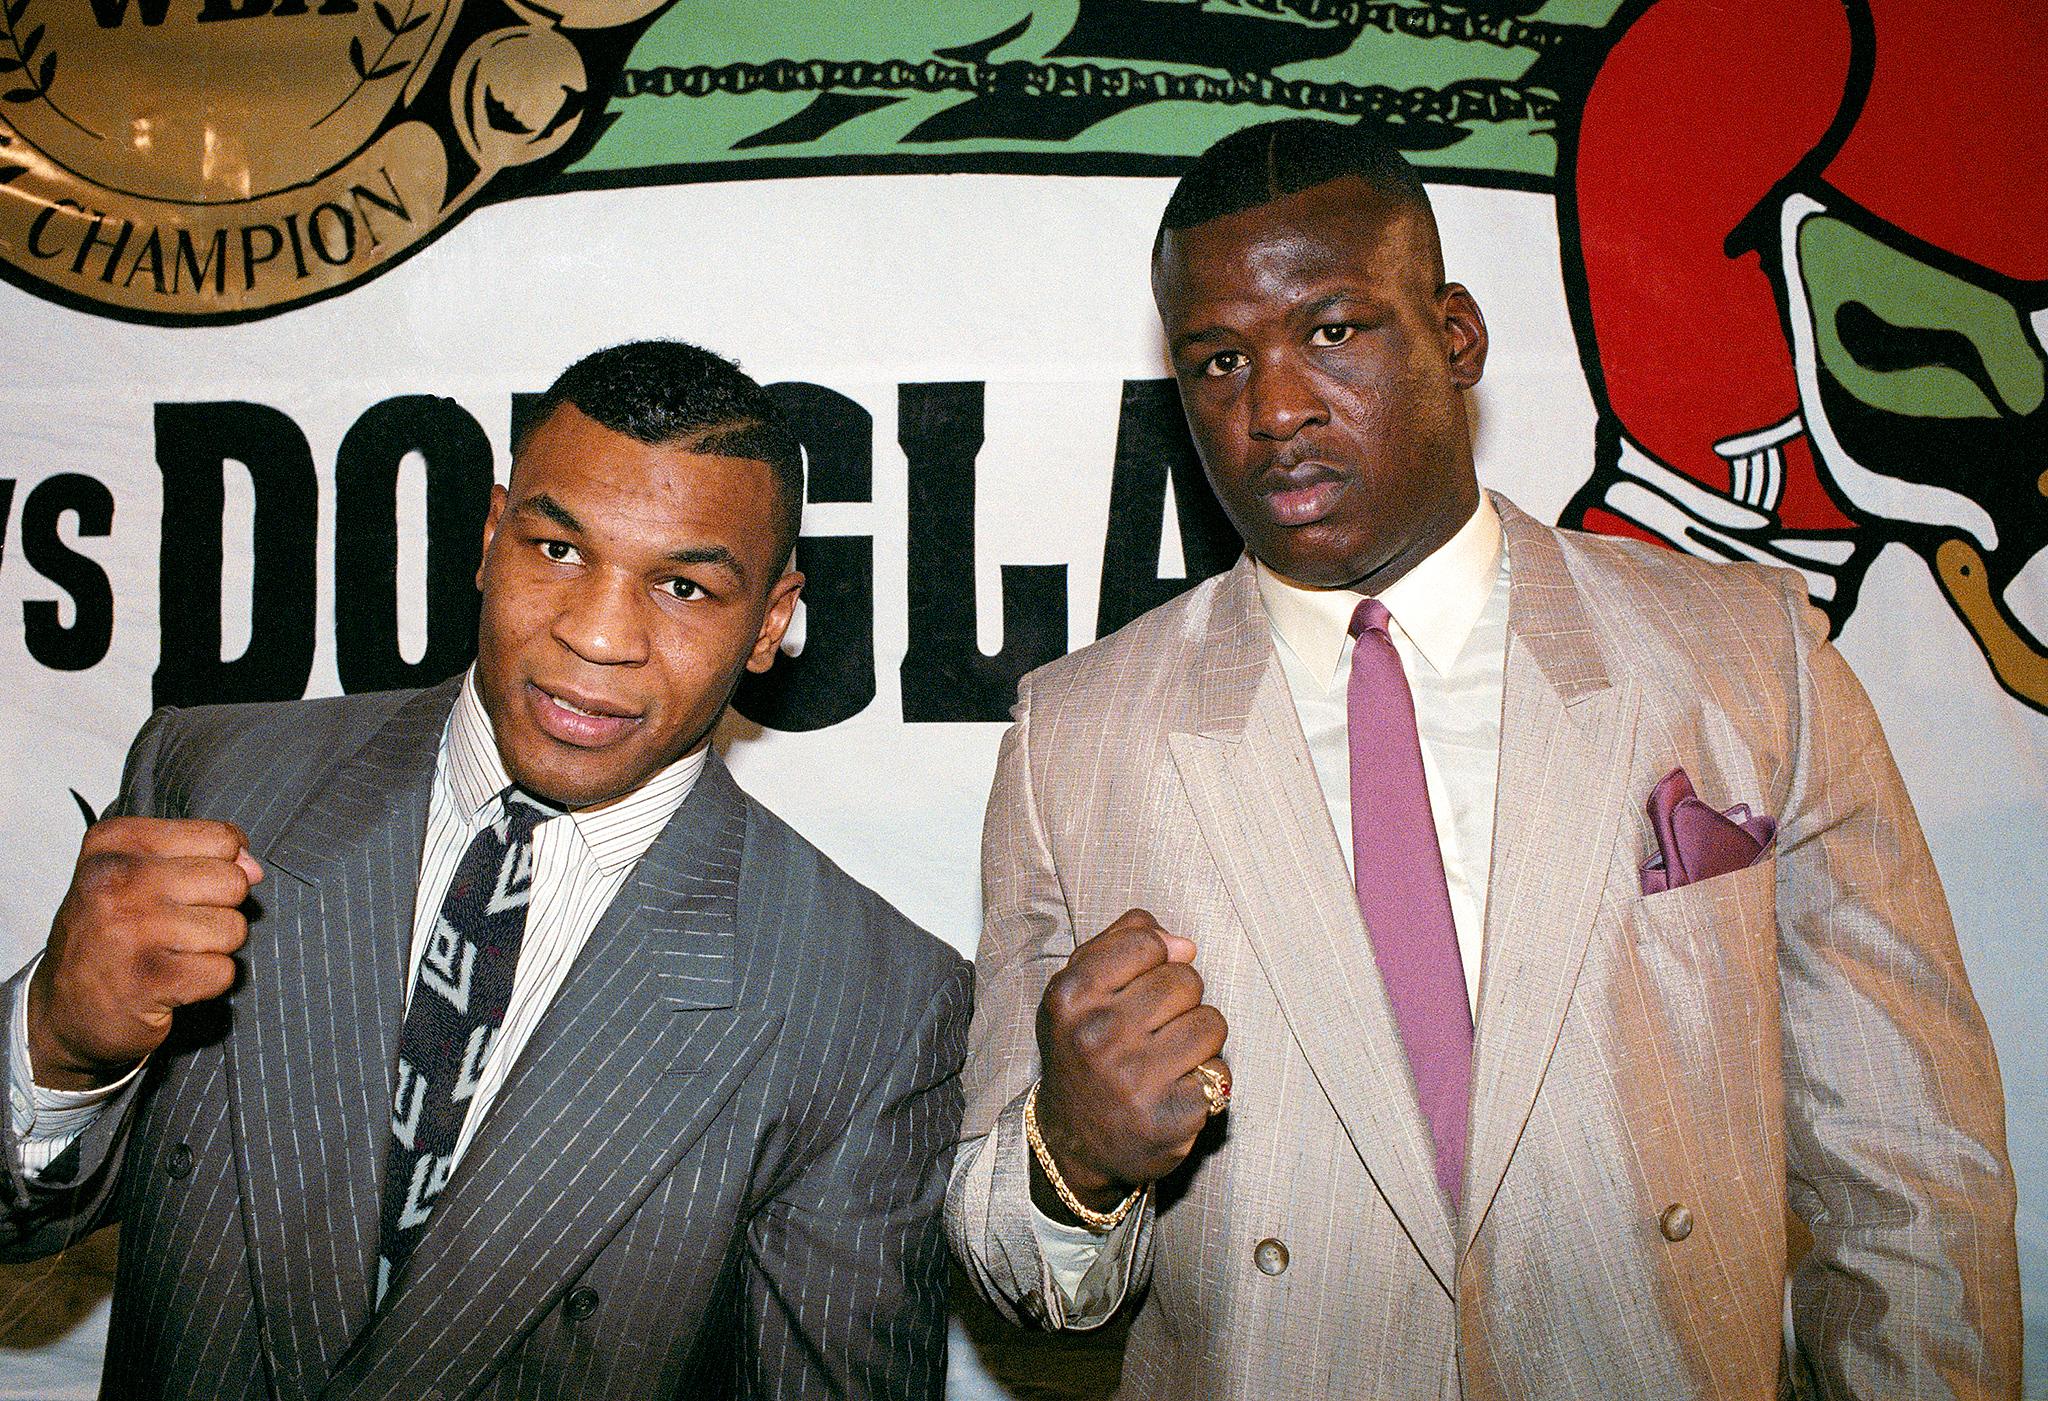 Nostalgia: Kekalahan Bersejarah Mike Tyson - Ragam Bola.com